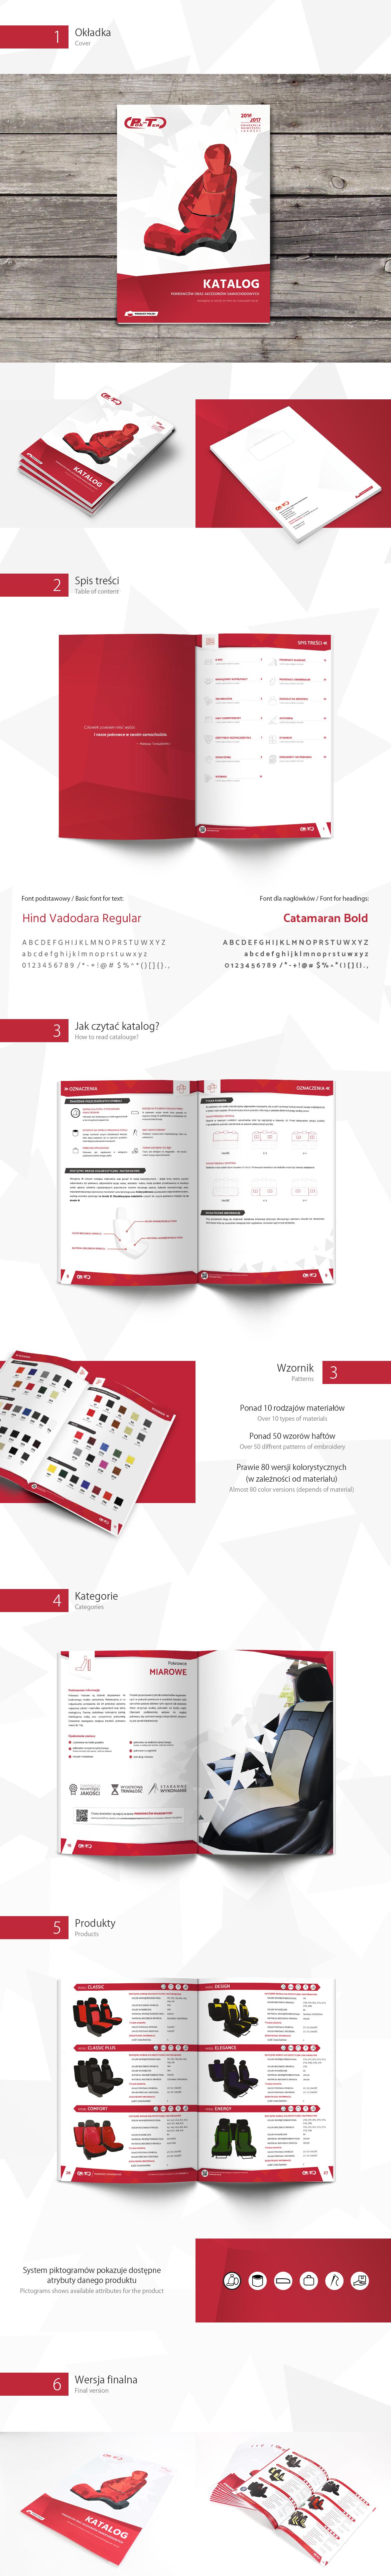 catalog Catalouge red car seat covers katalog